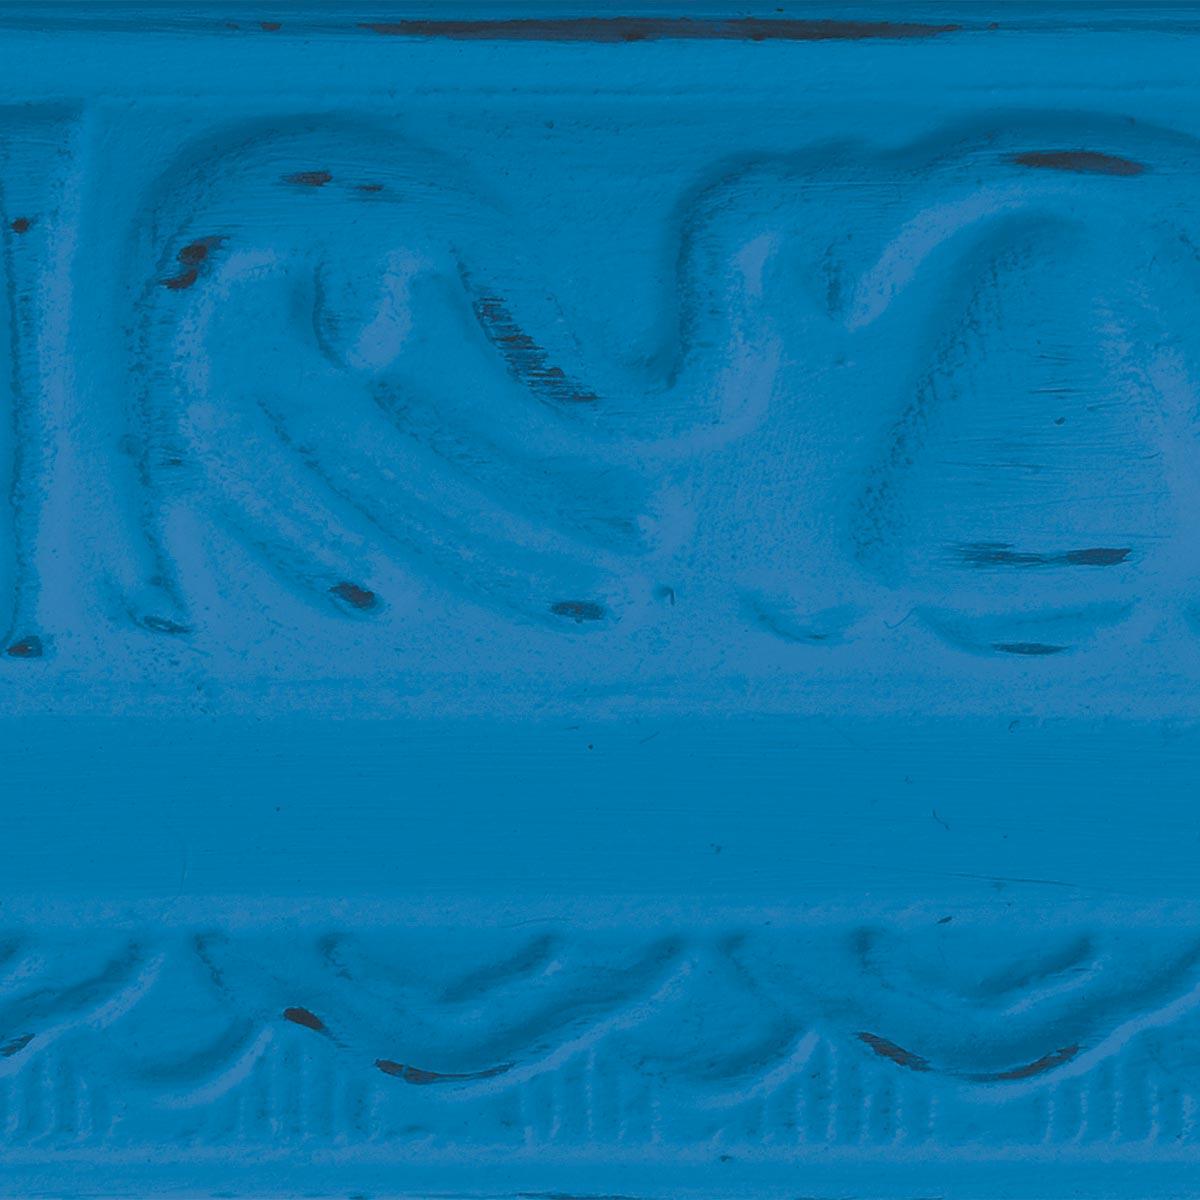 FolkArt ® Home Decor™ Chalk - Provincial Blue, 2 oz.